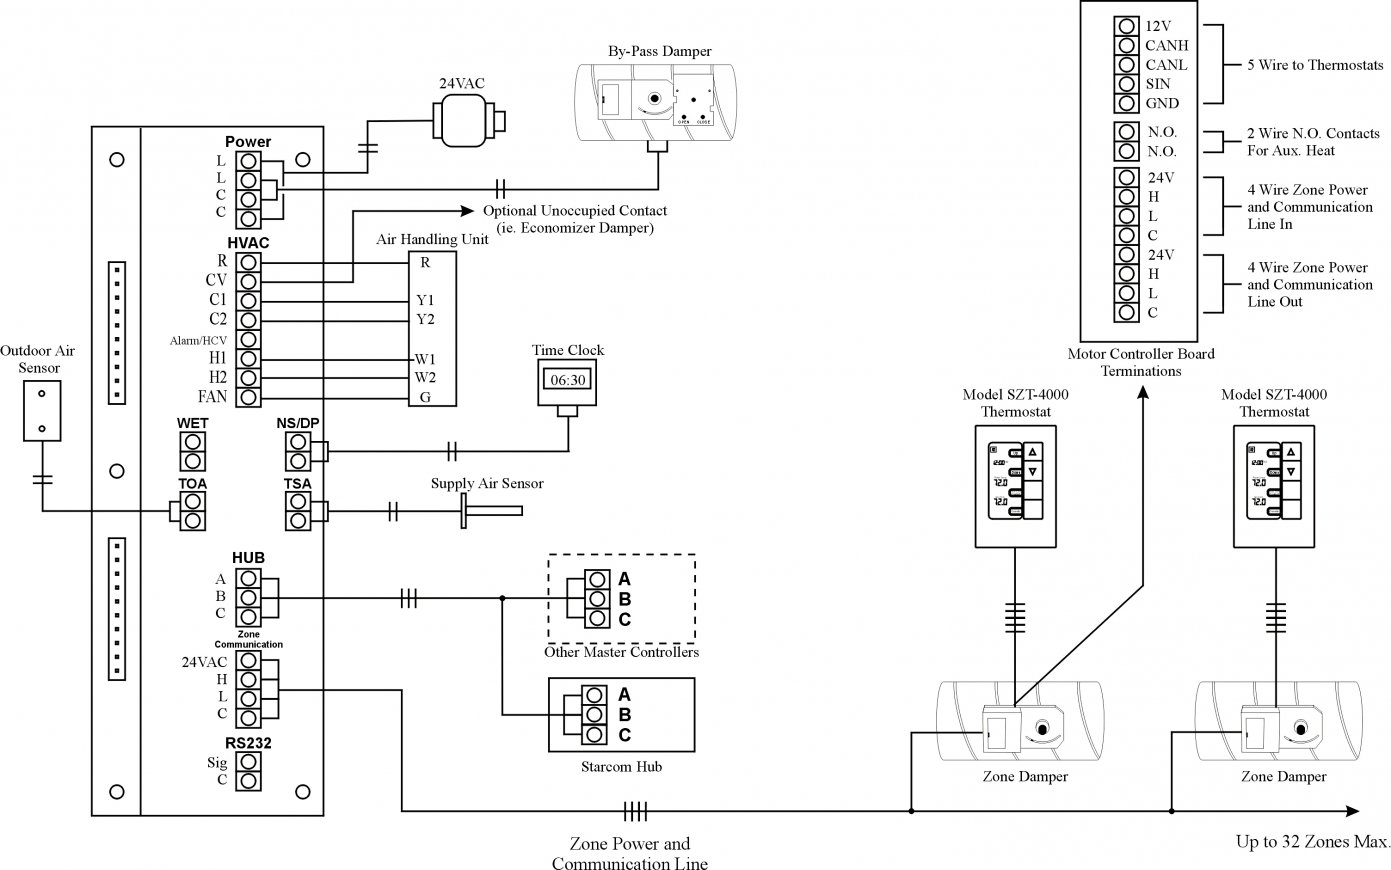 Fire Detector Wiring Diagram | Wiring Diagram - 4 Wire Smoke Detector Wiring Diagram